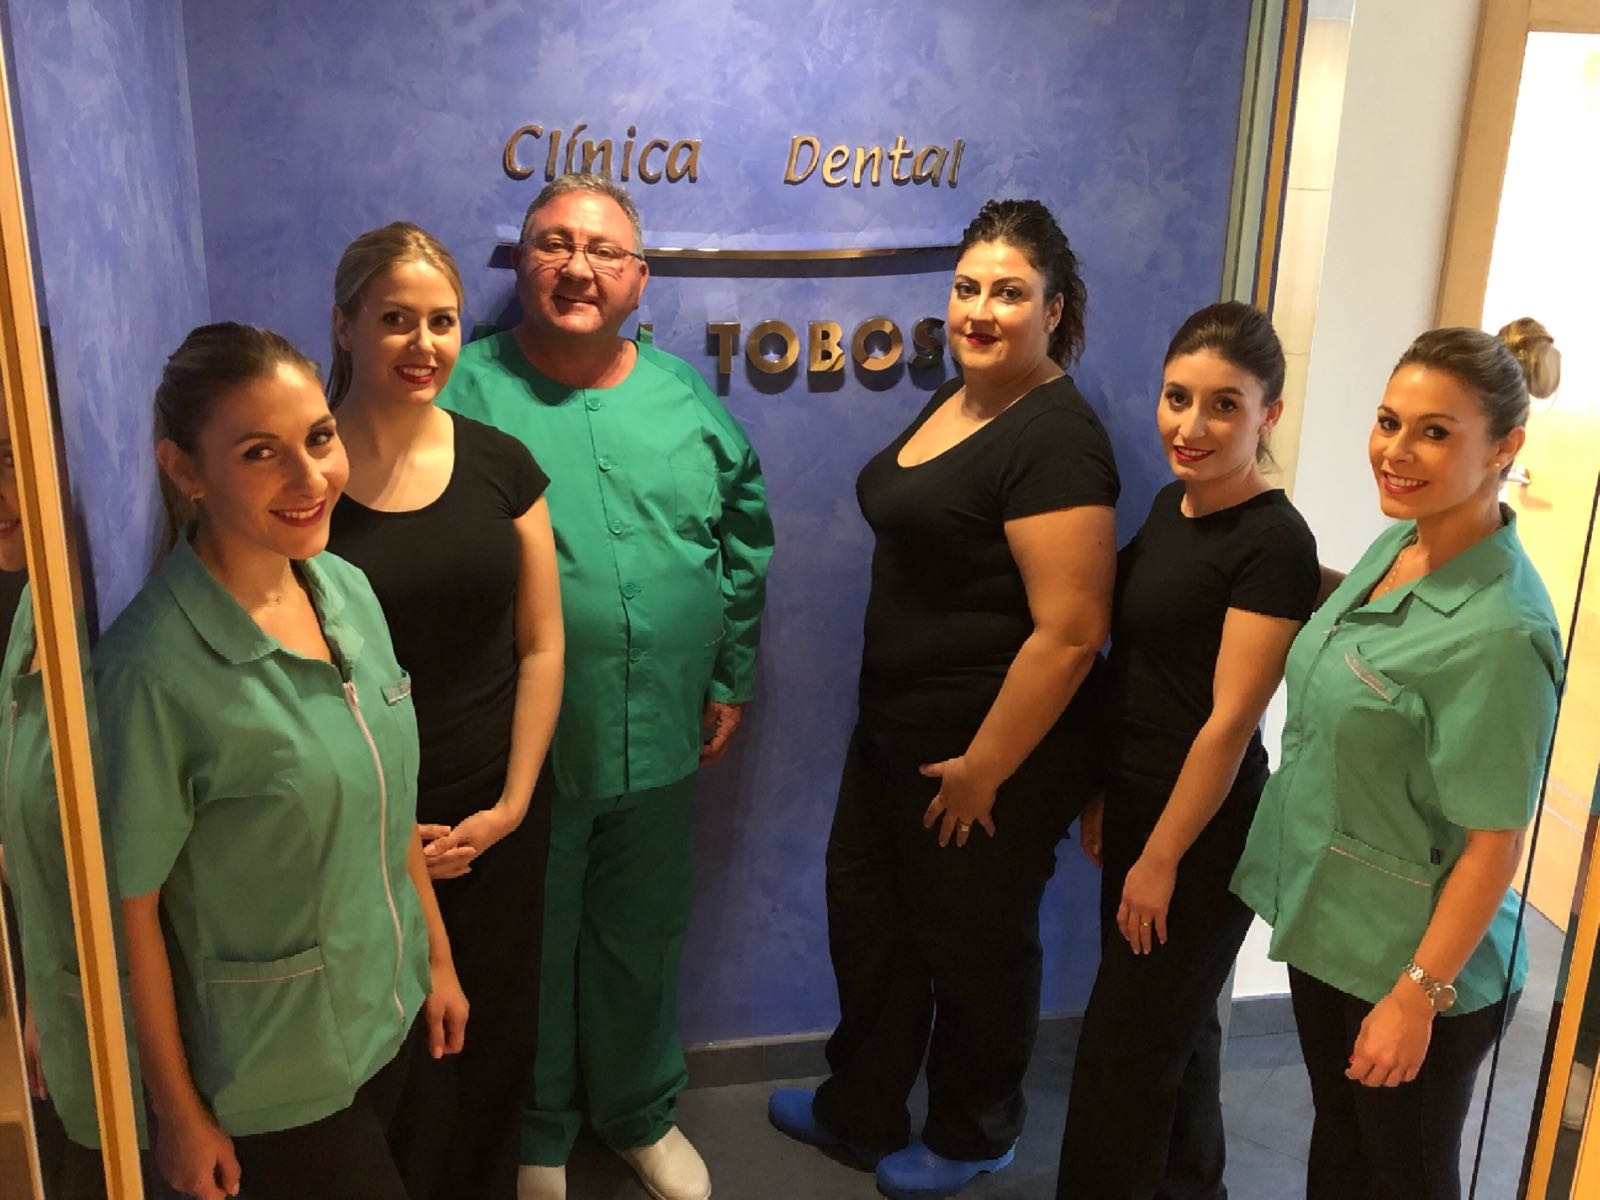 Clinica Dental Toboso